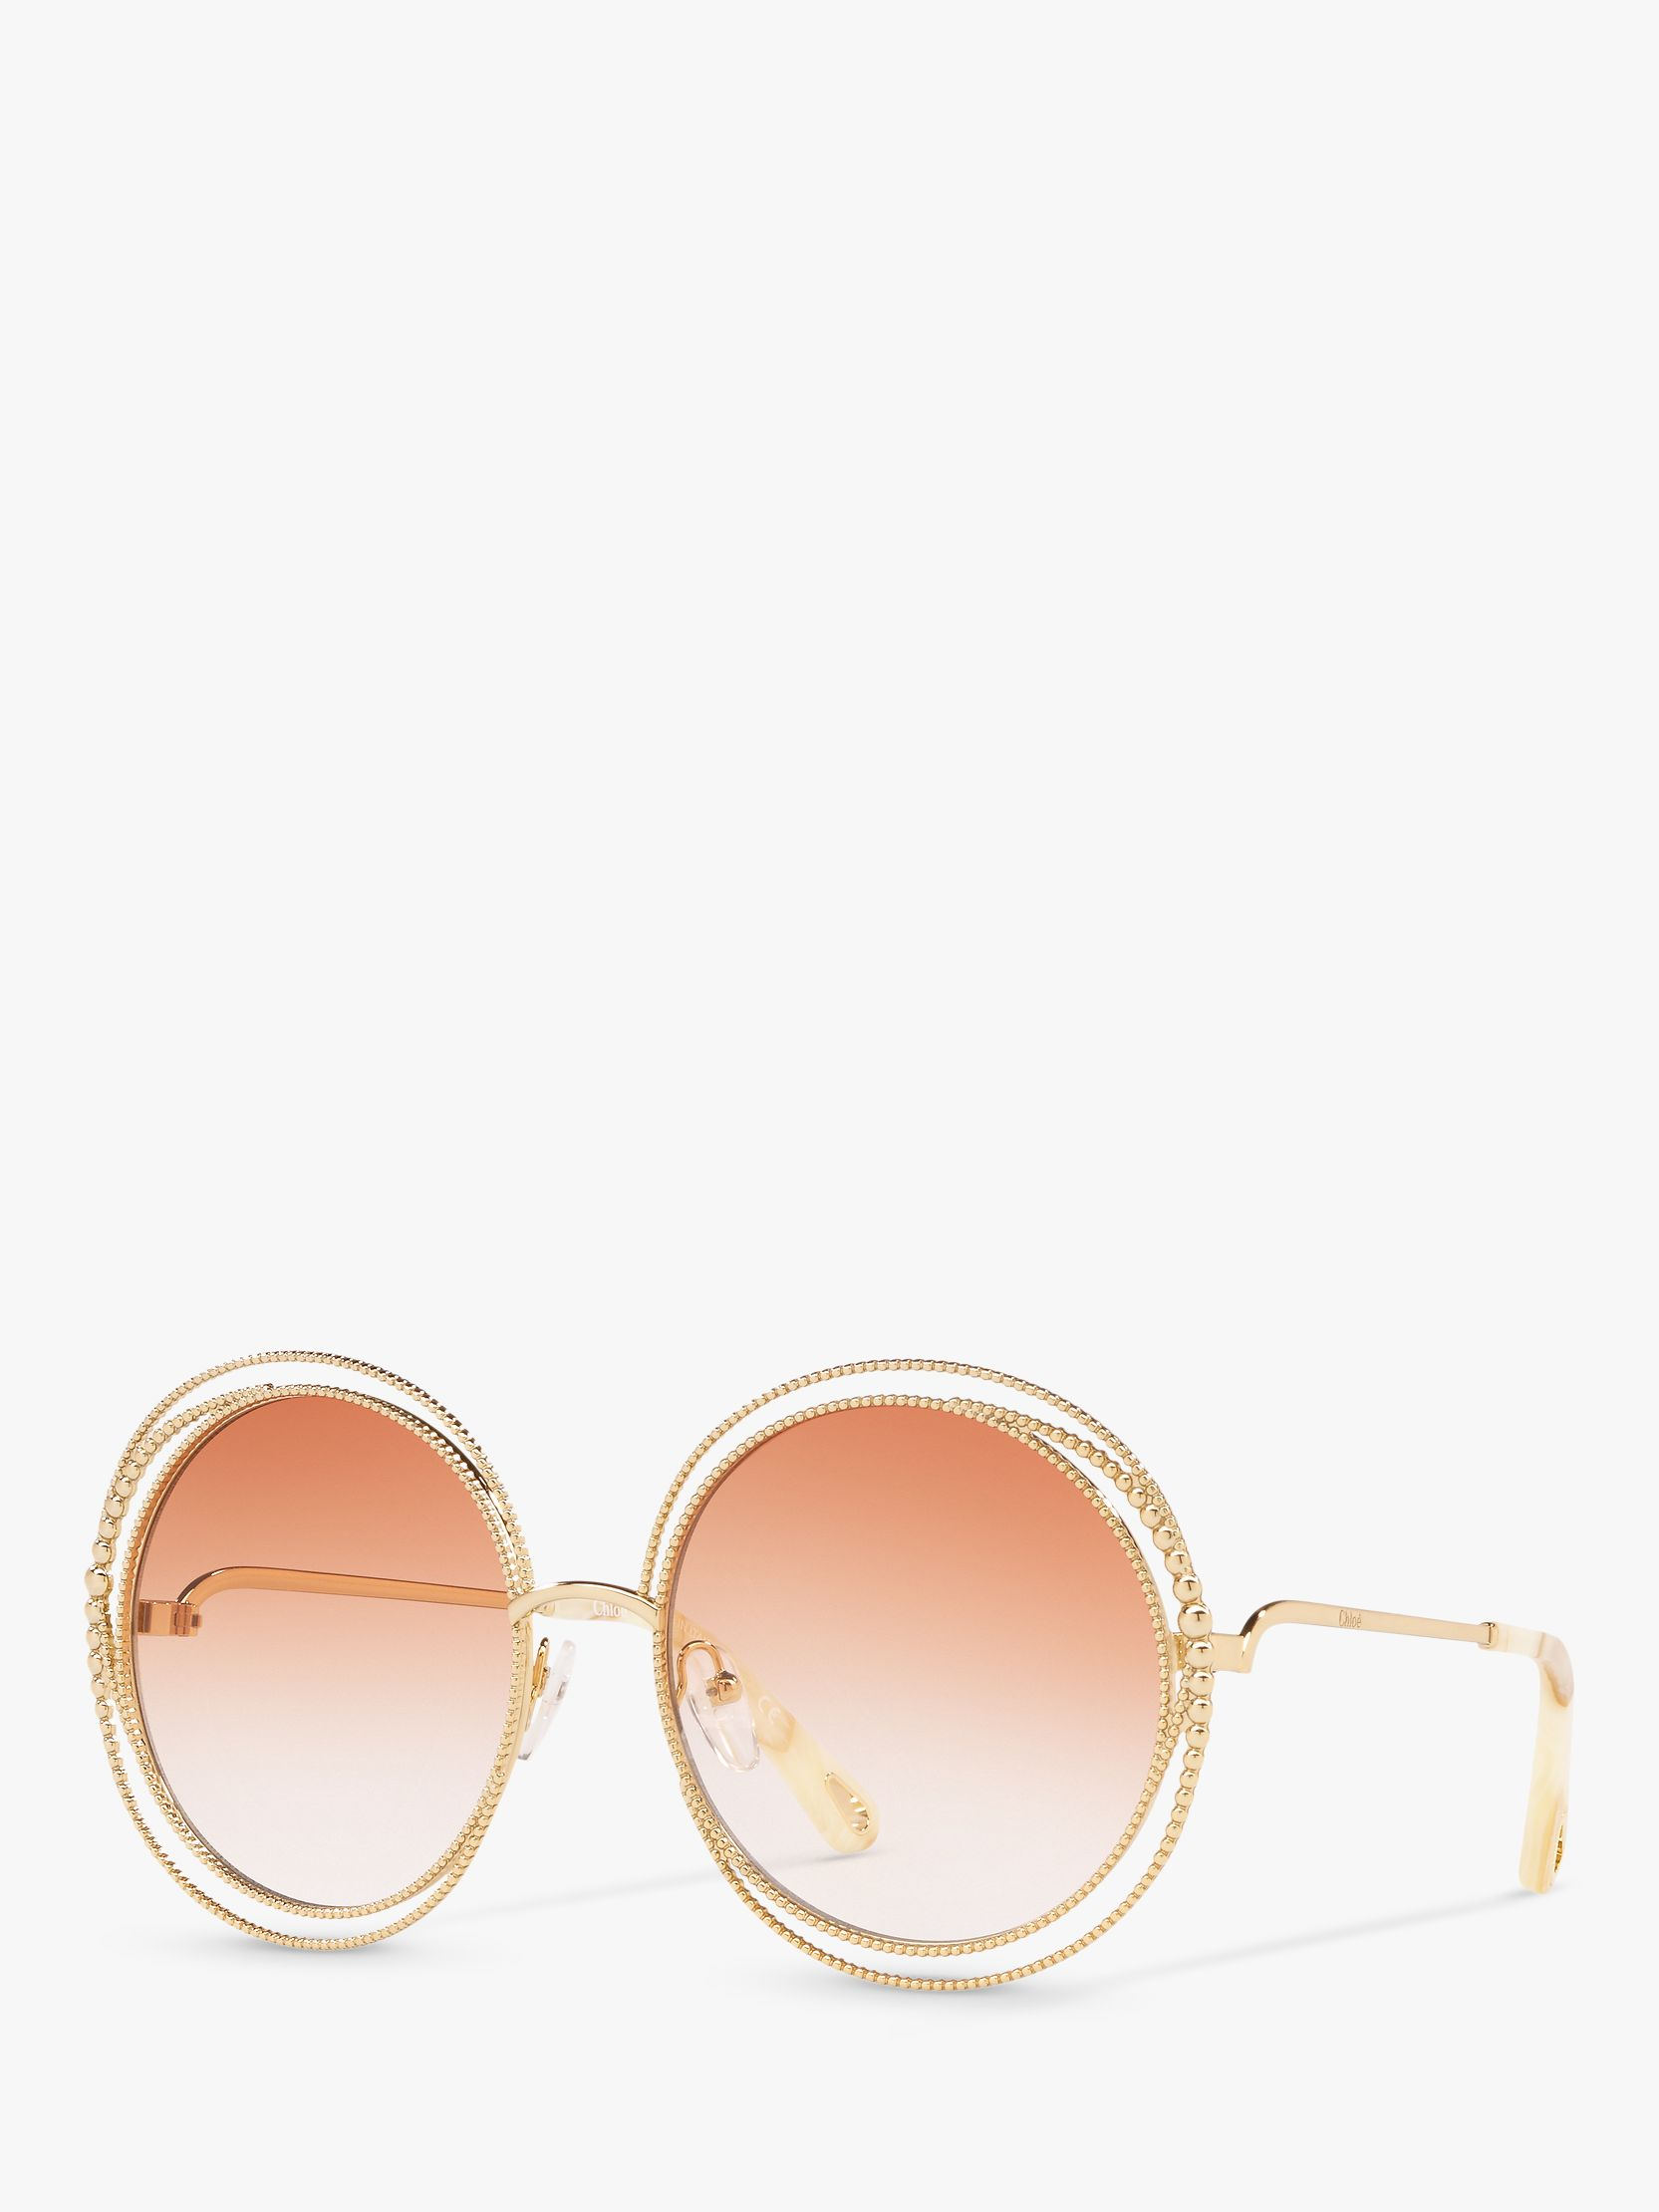 Chloe Chloé CE114SC Women's Round Sunglasses